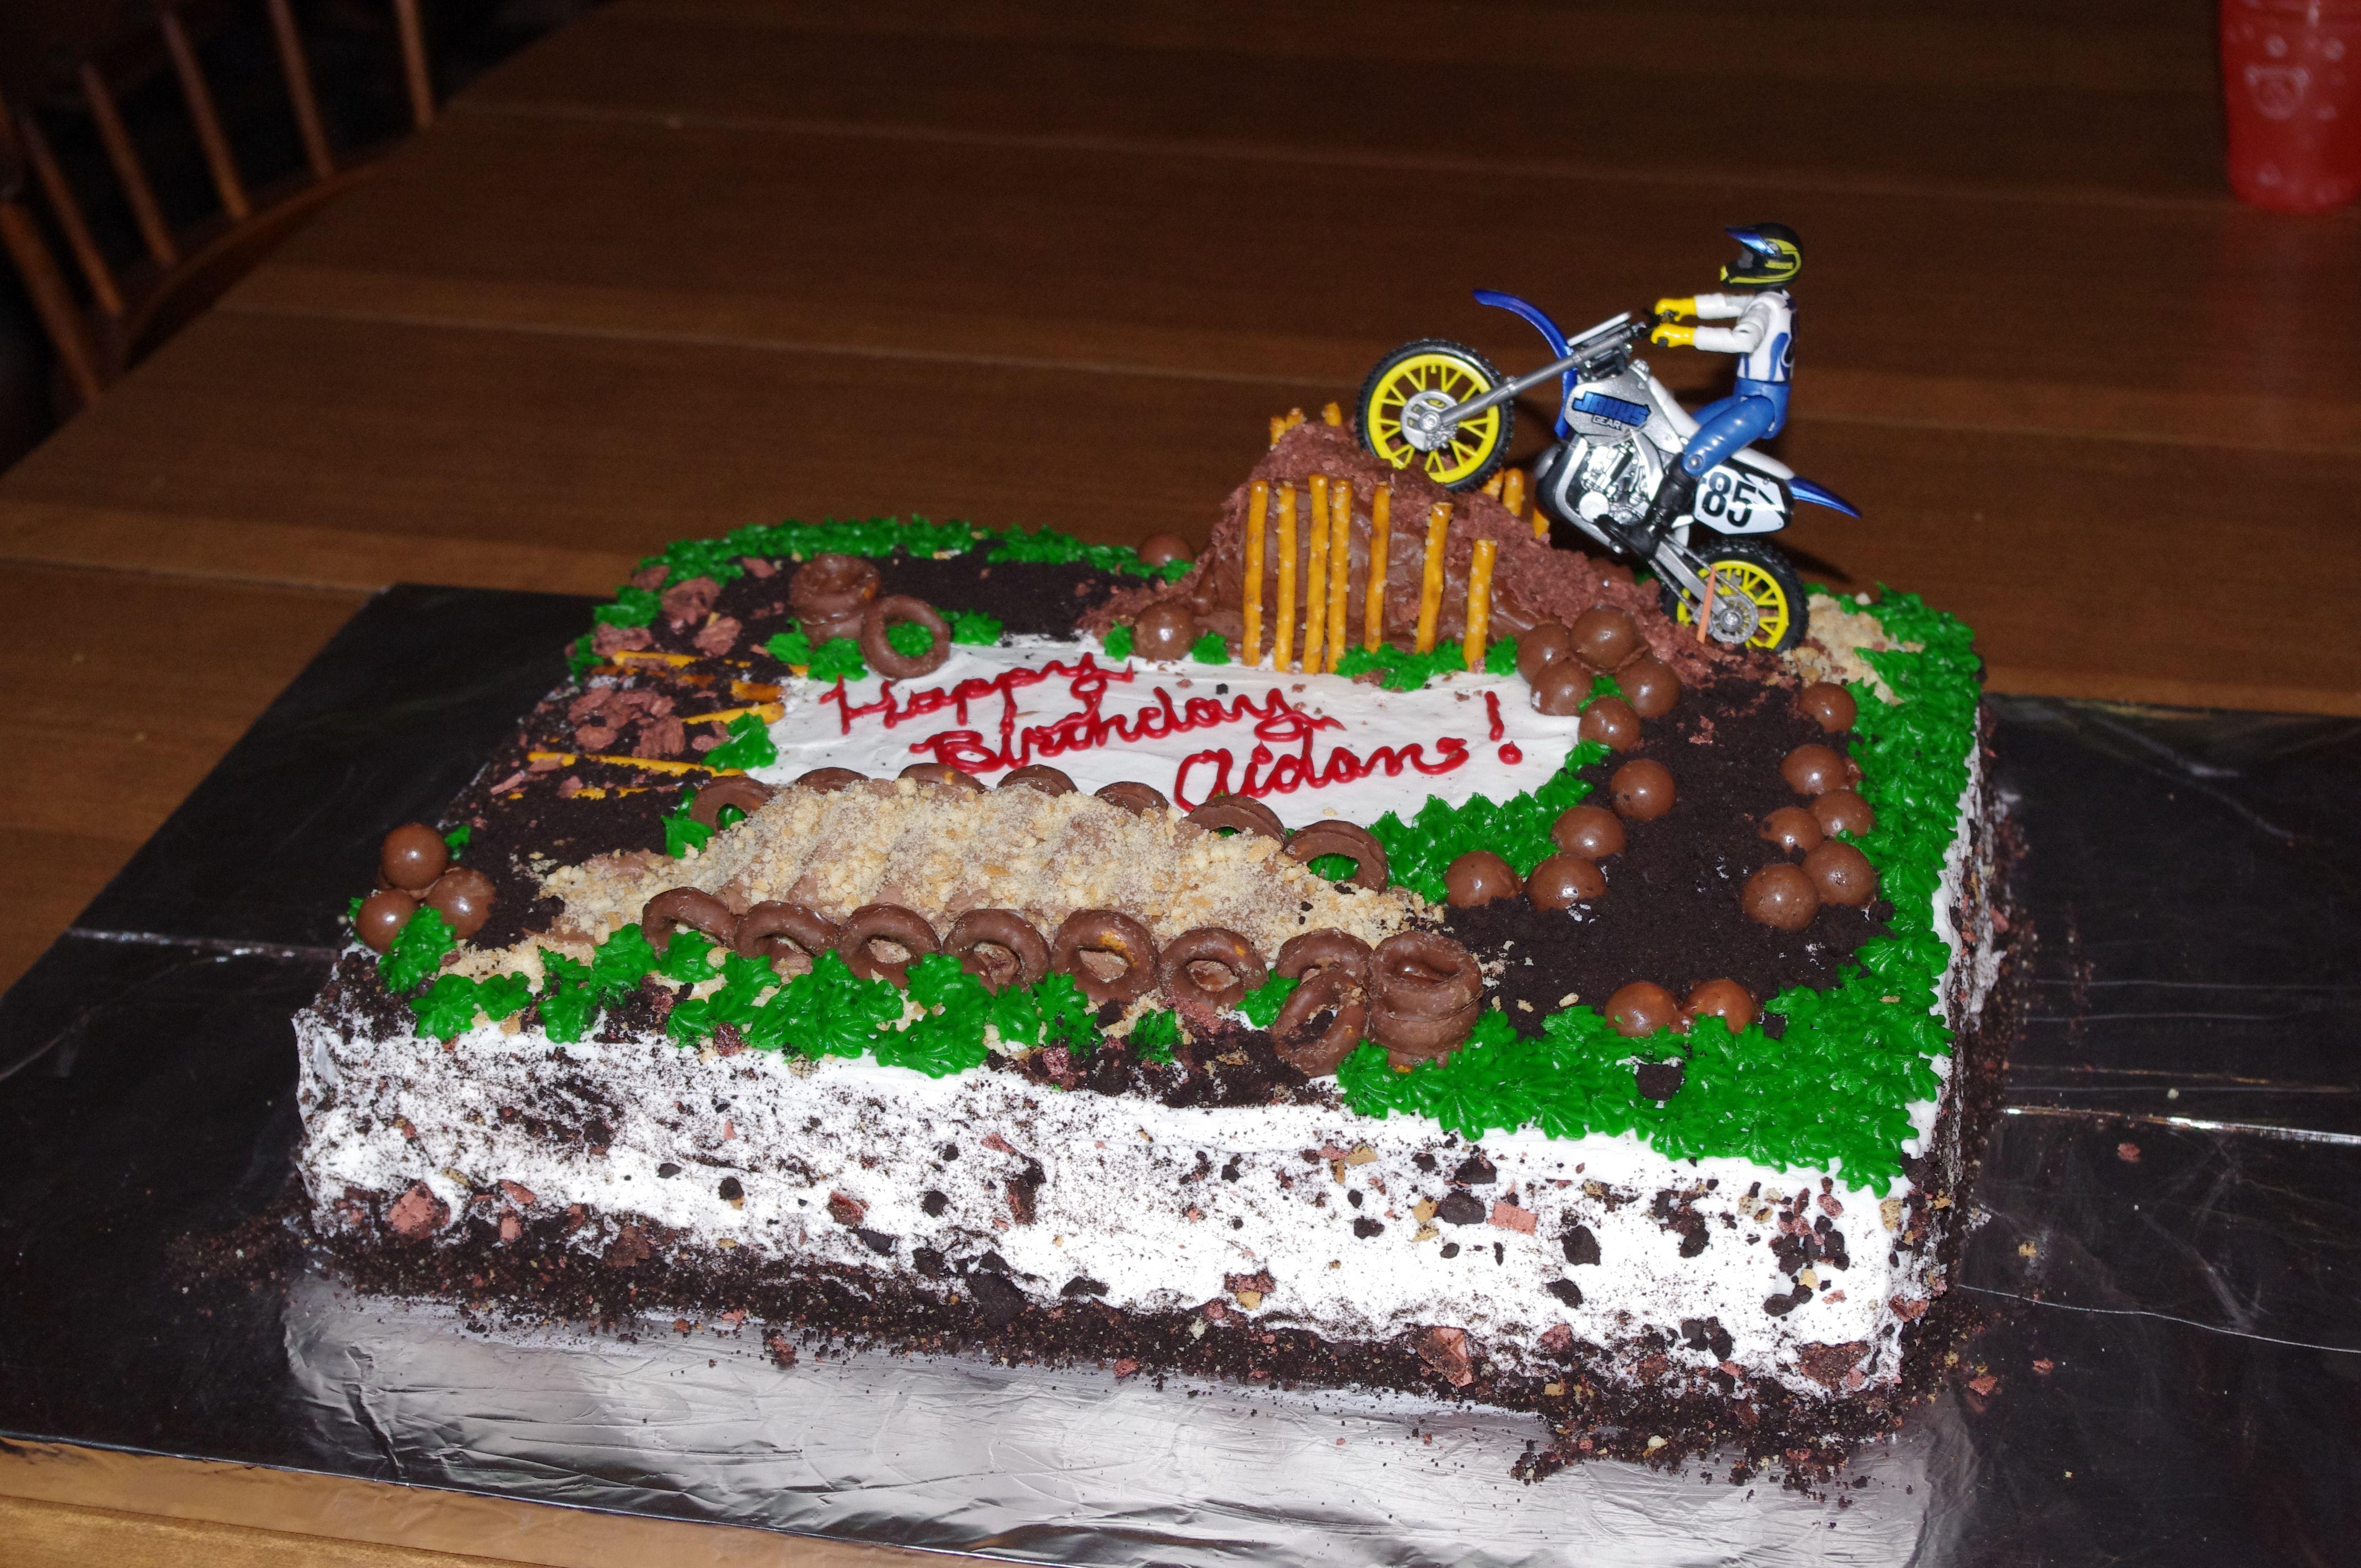 Bike Decoration For Cake : Share